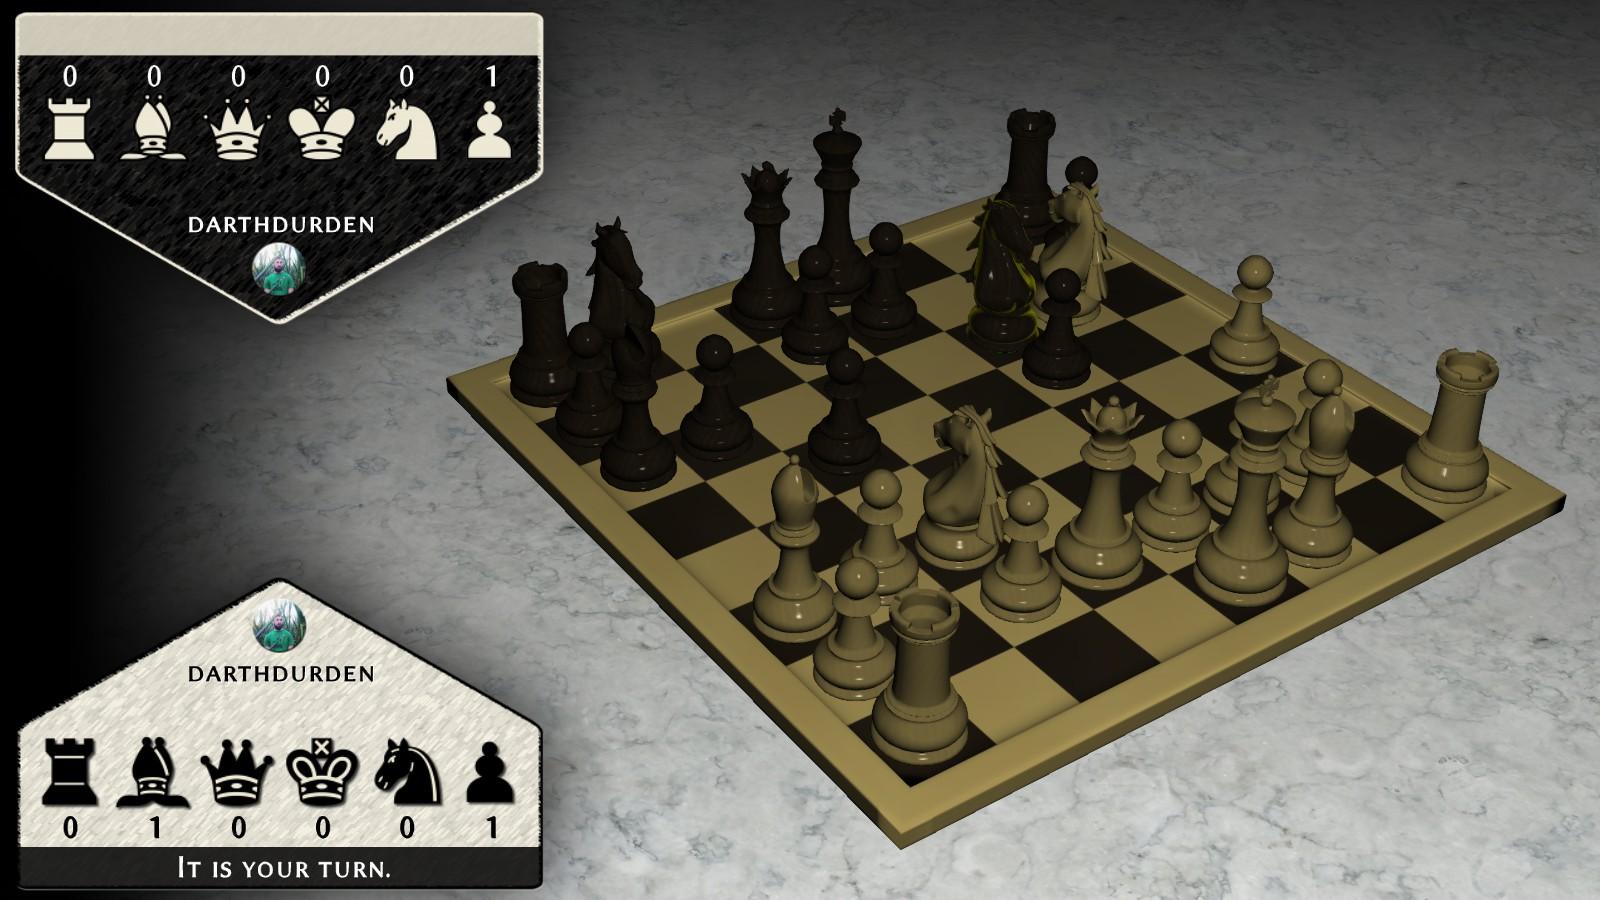 Premium chess set